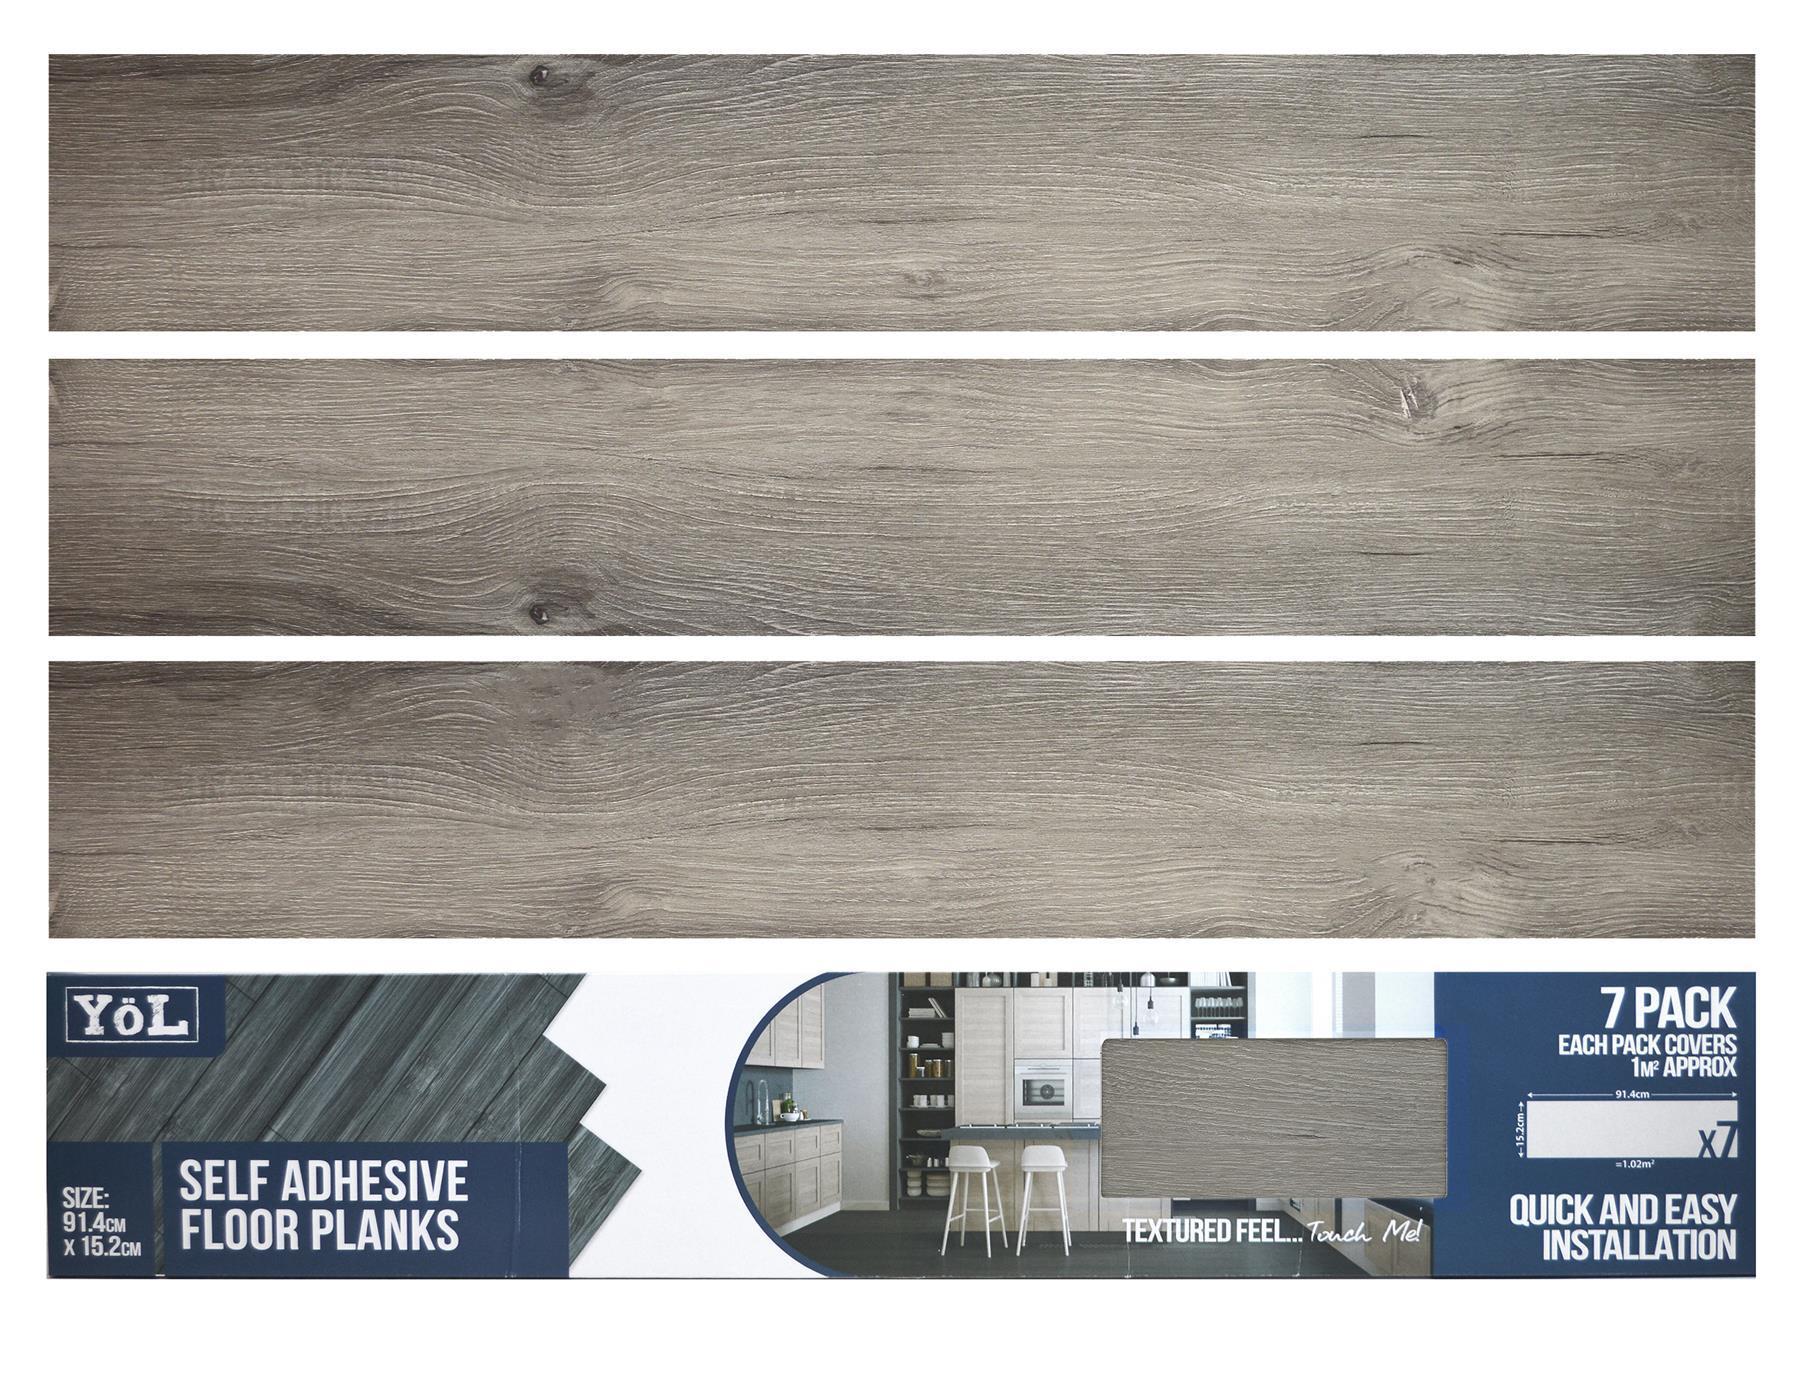 thumbnail 2 - Floor Planks Tiles Self Adhesive Dark Grey Wood Vinyl Flooring Kitchen Bathroom